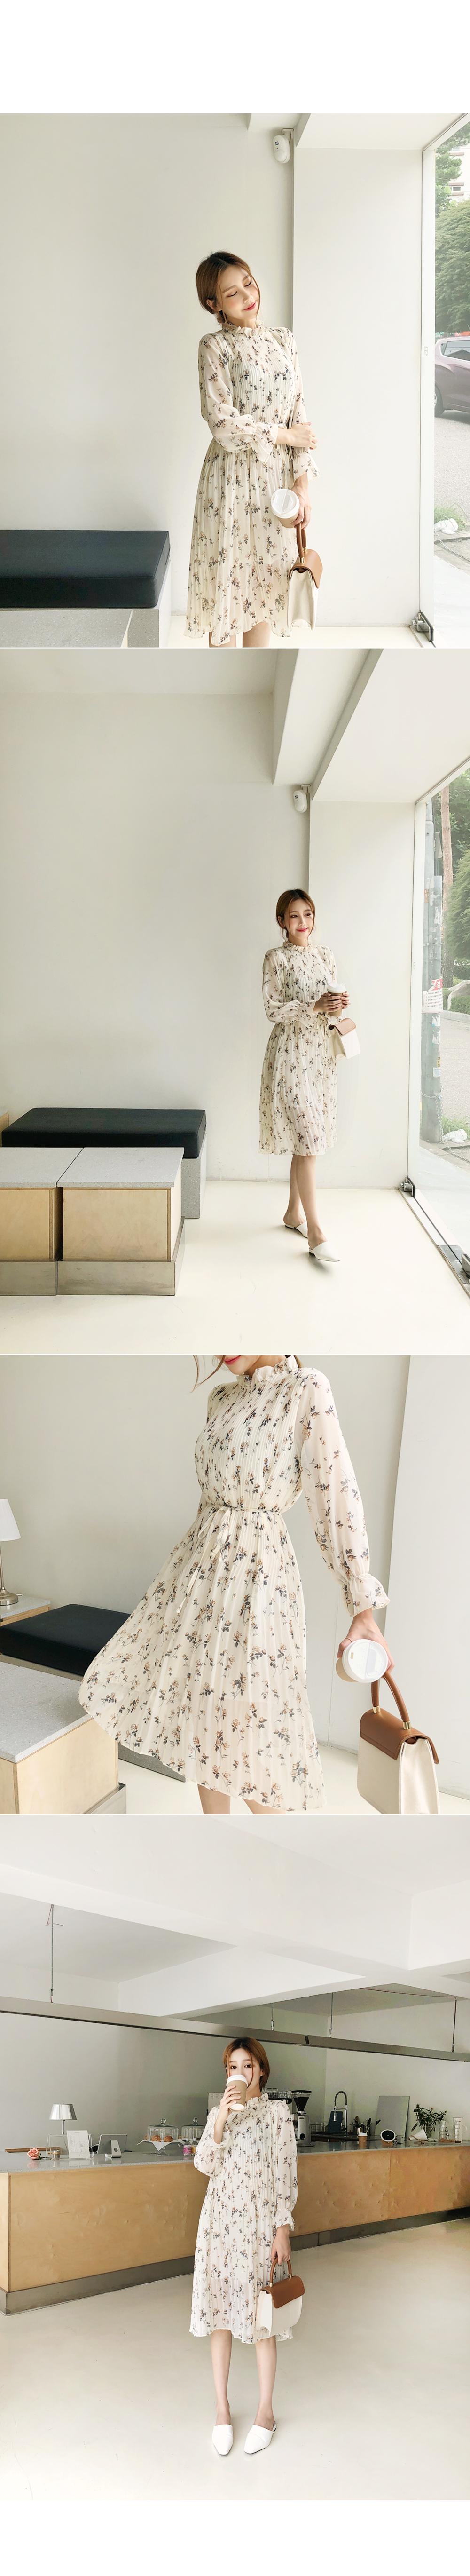 Pounding pleated dress